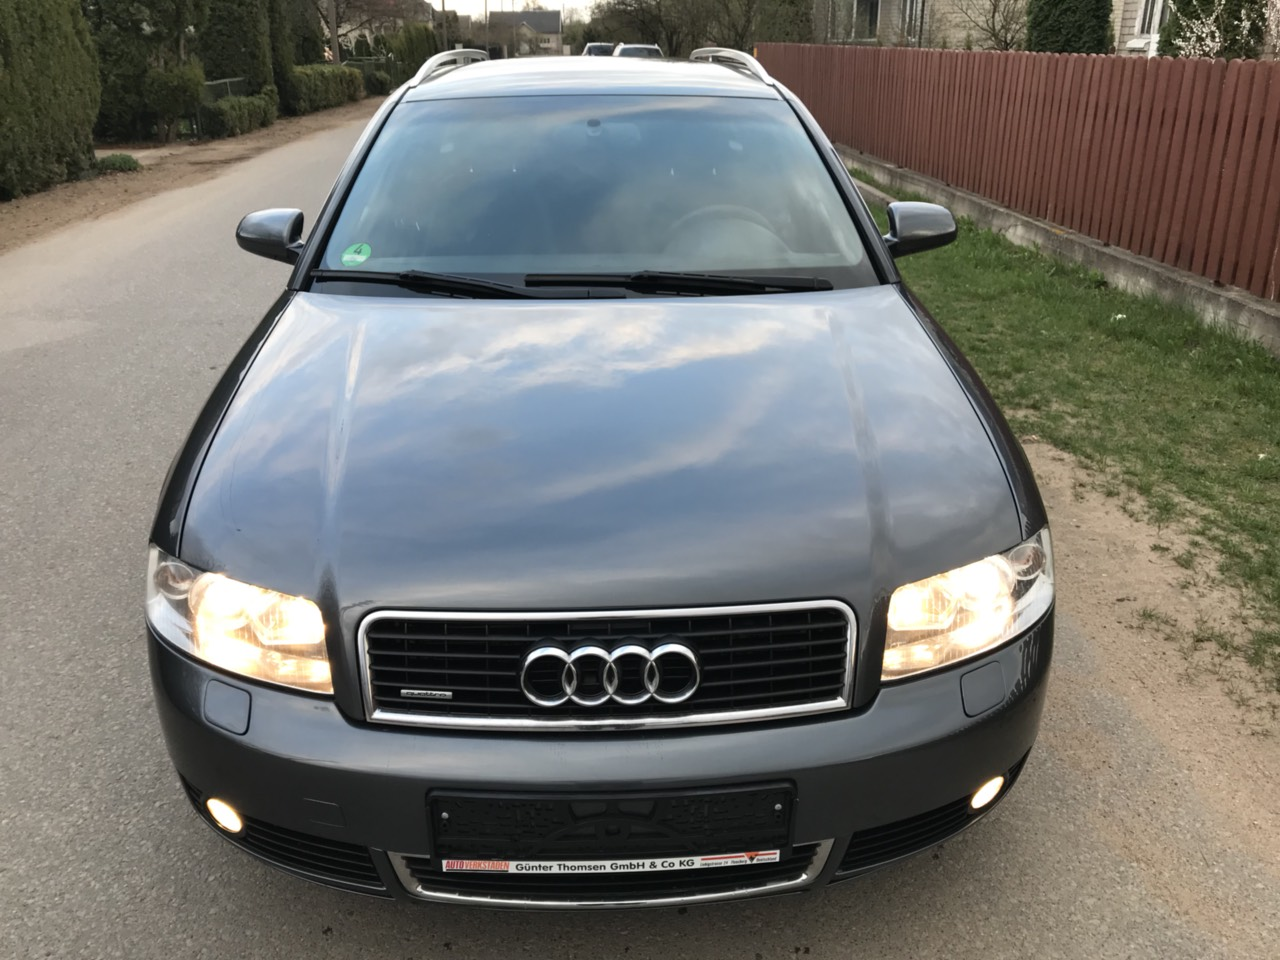 Audi A4, 2.5